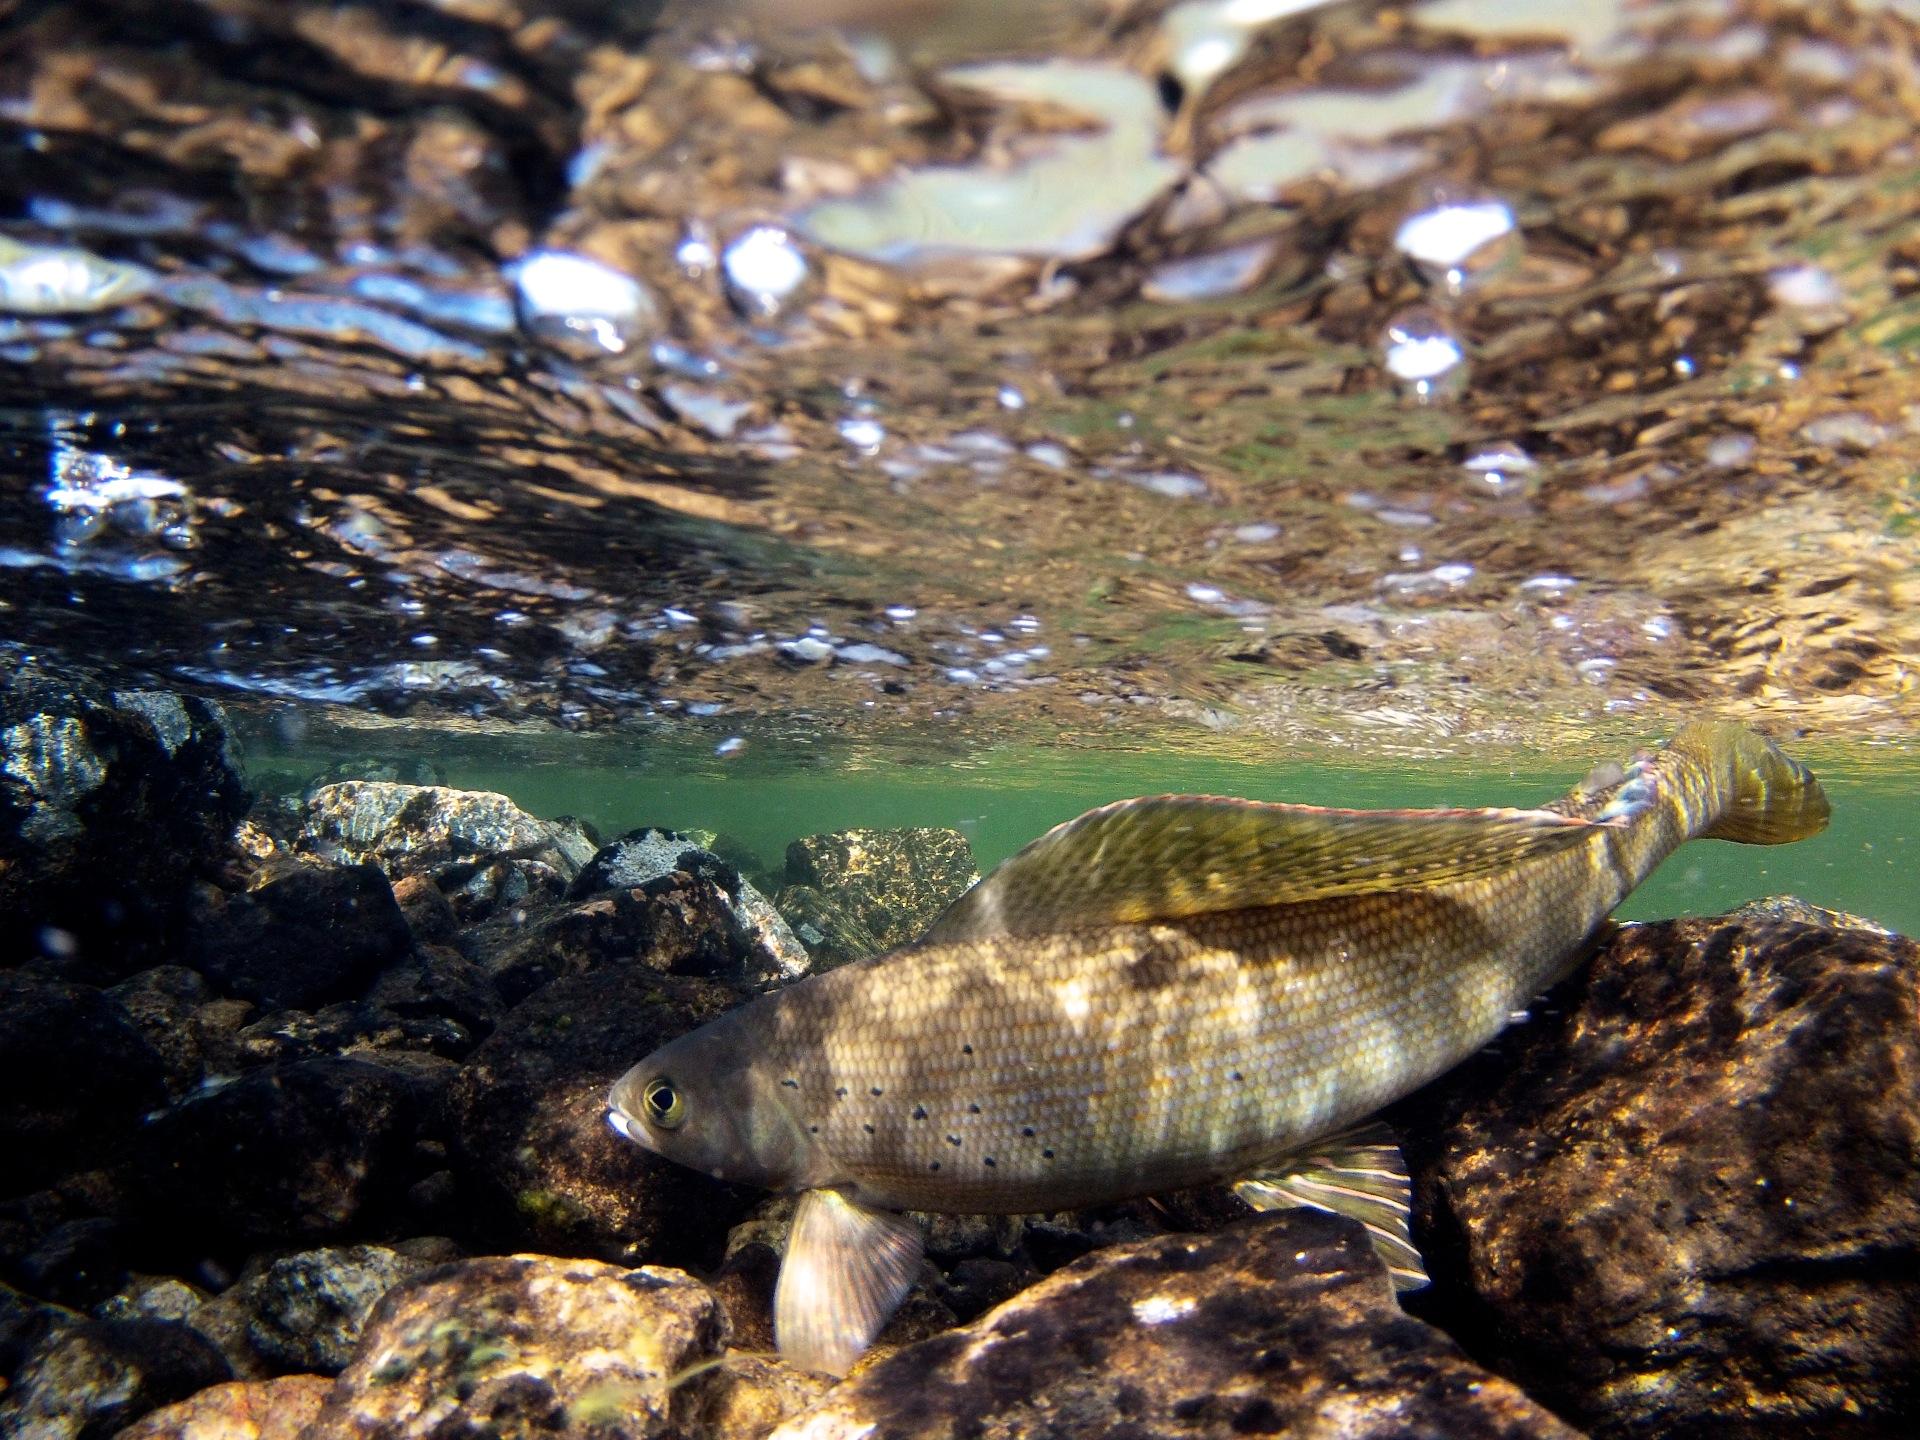 Arctic Grayling in it's pristine natural habitat